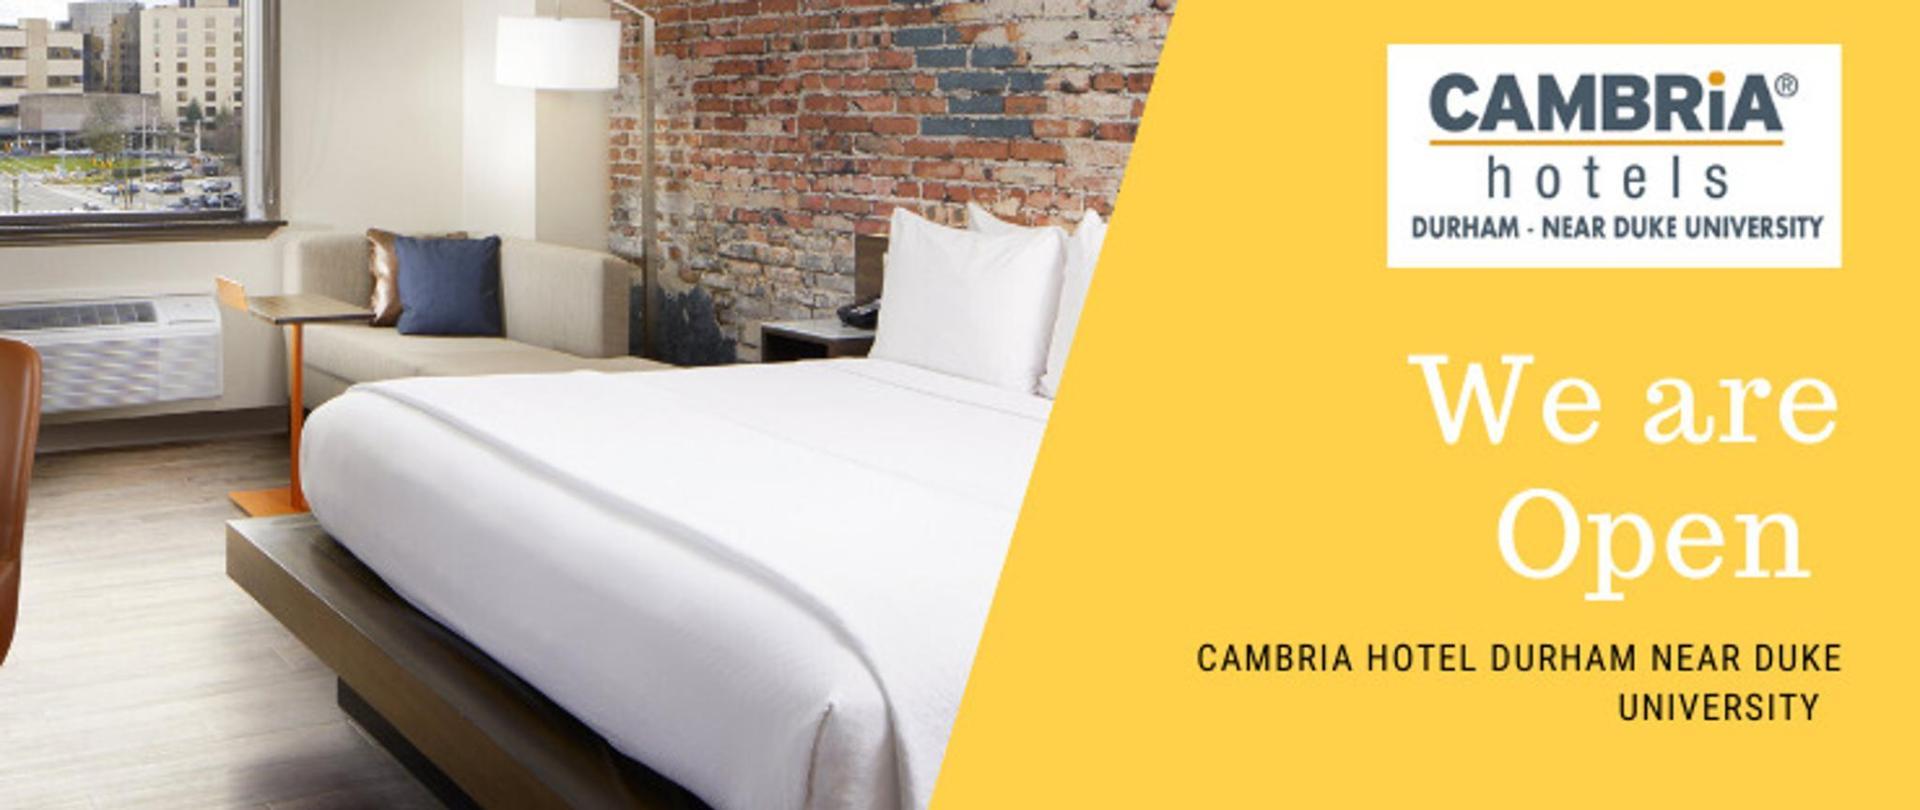 Cambria Hotel Durham - Near Duke University-1.png